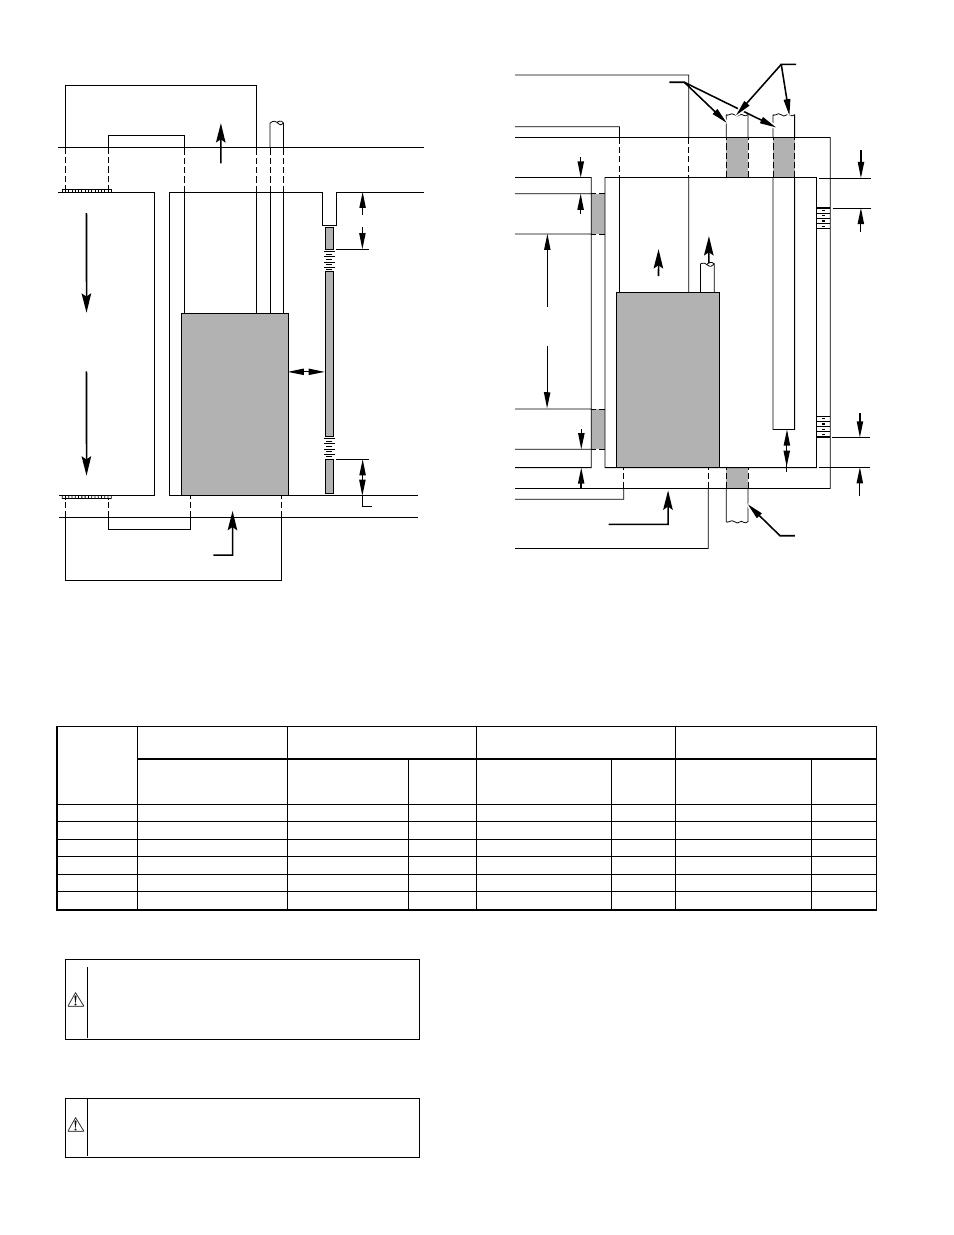 medium resolution of confined space ventilation diagram